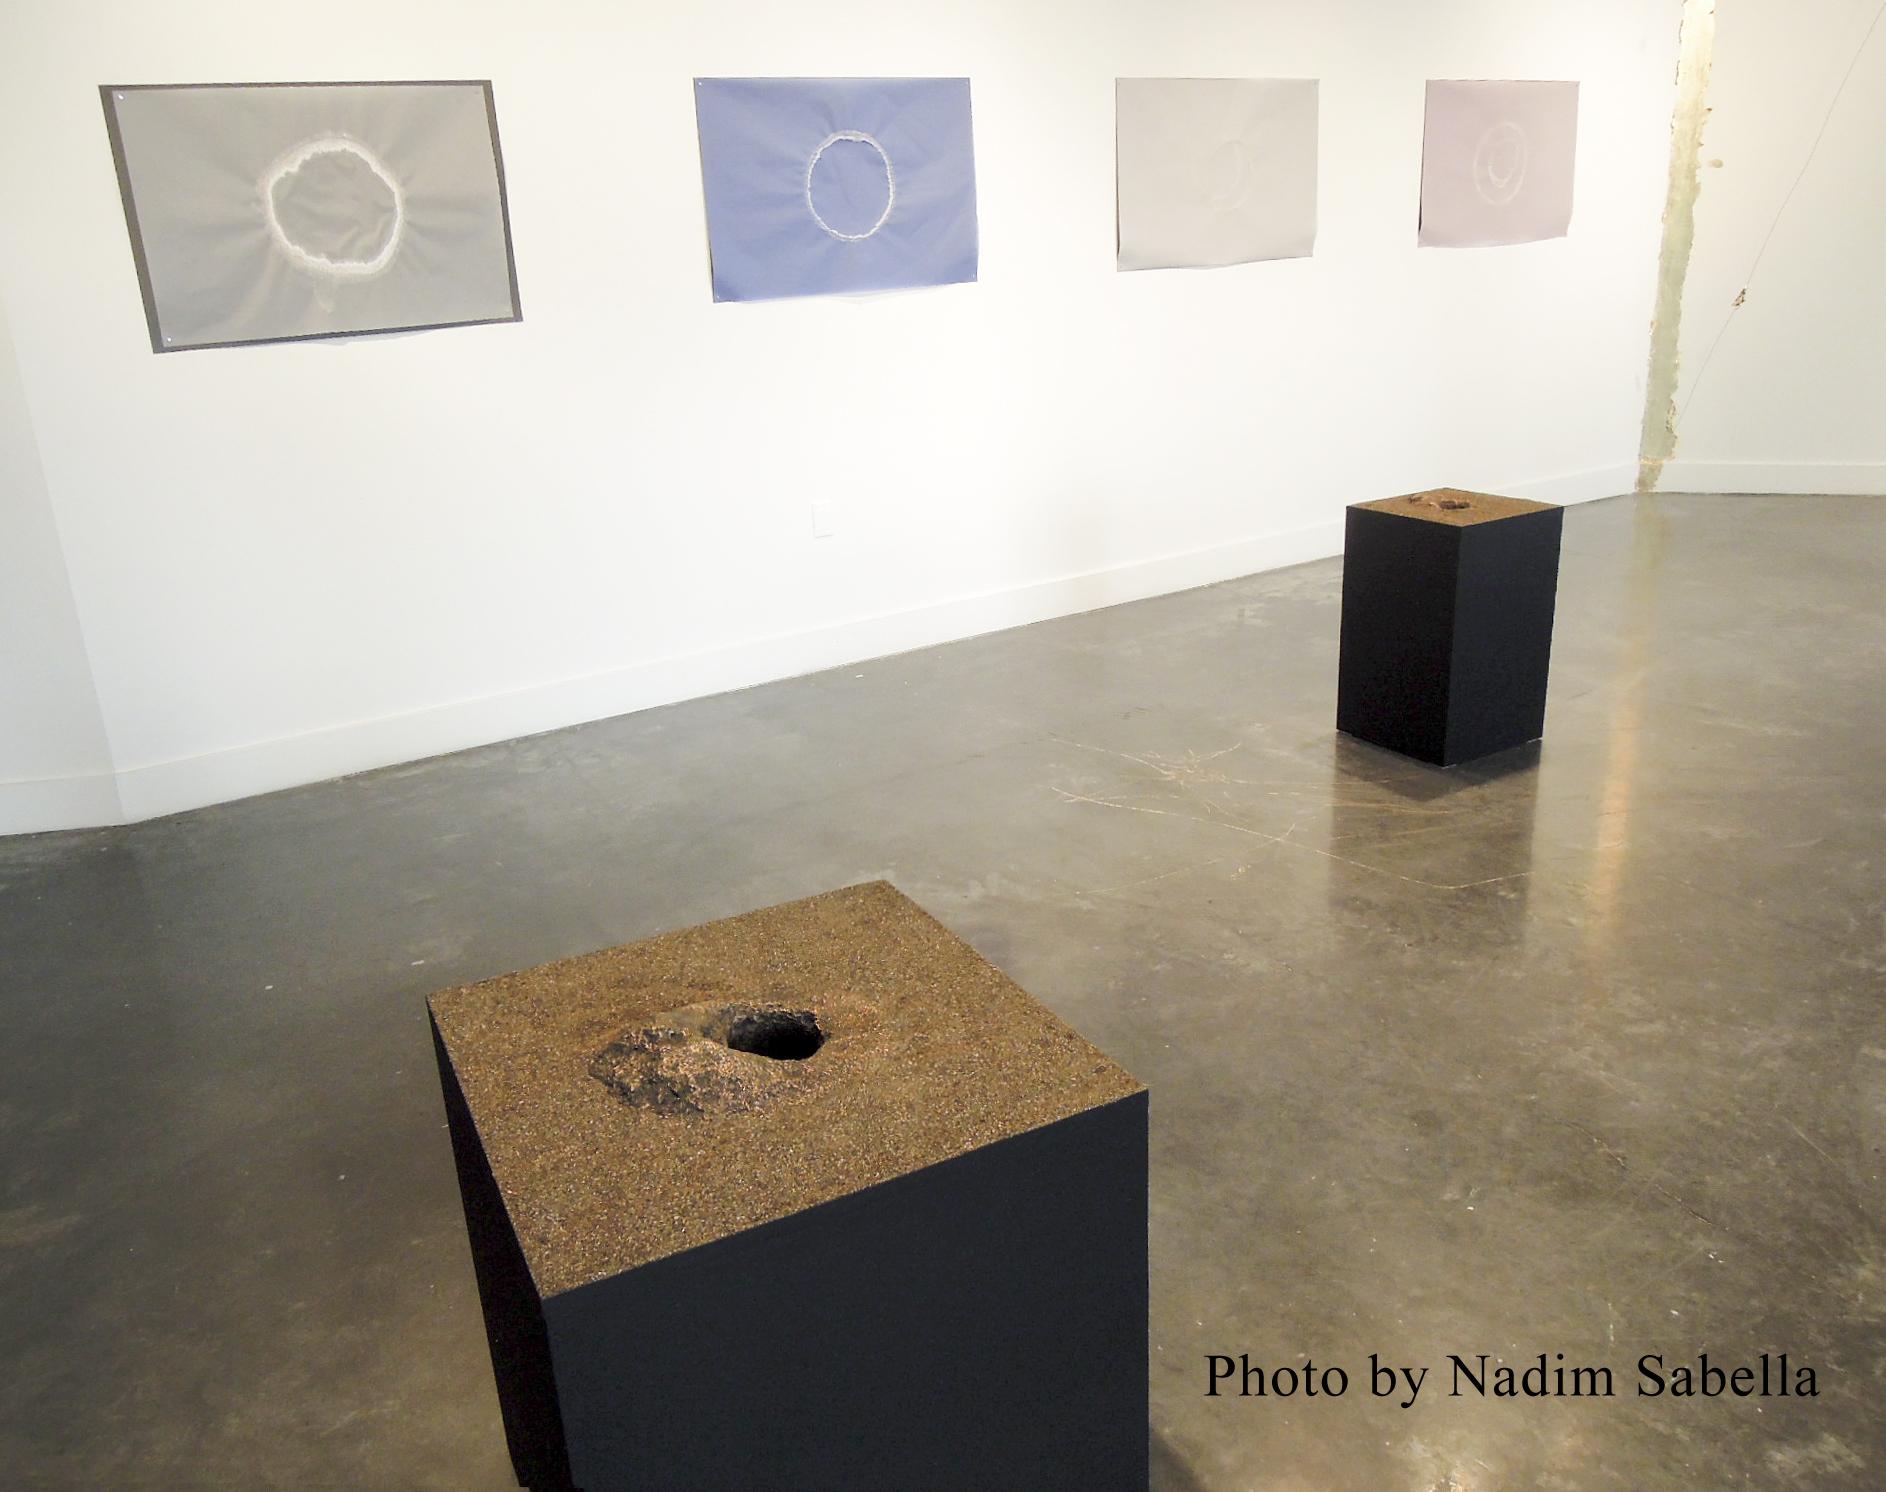 Ali Nashke Messing Installation Shots Edited 0.jpg